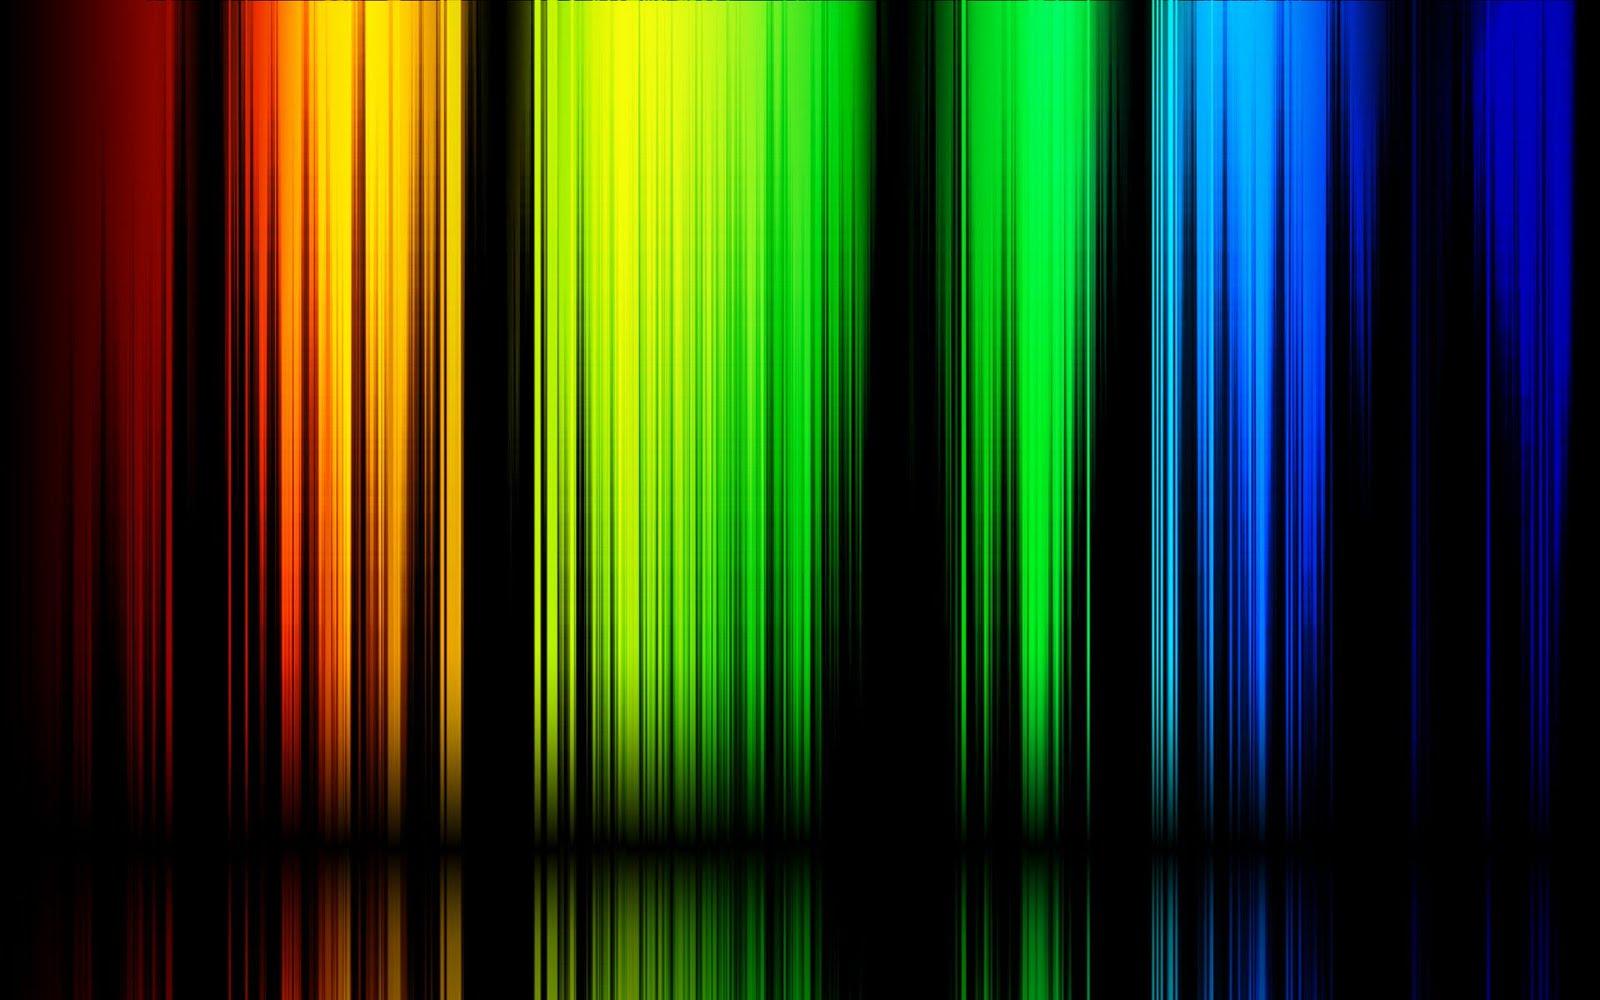 natural colorful 3d desktop wallpaper - photo #33